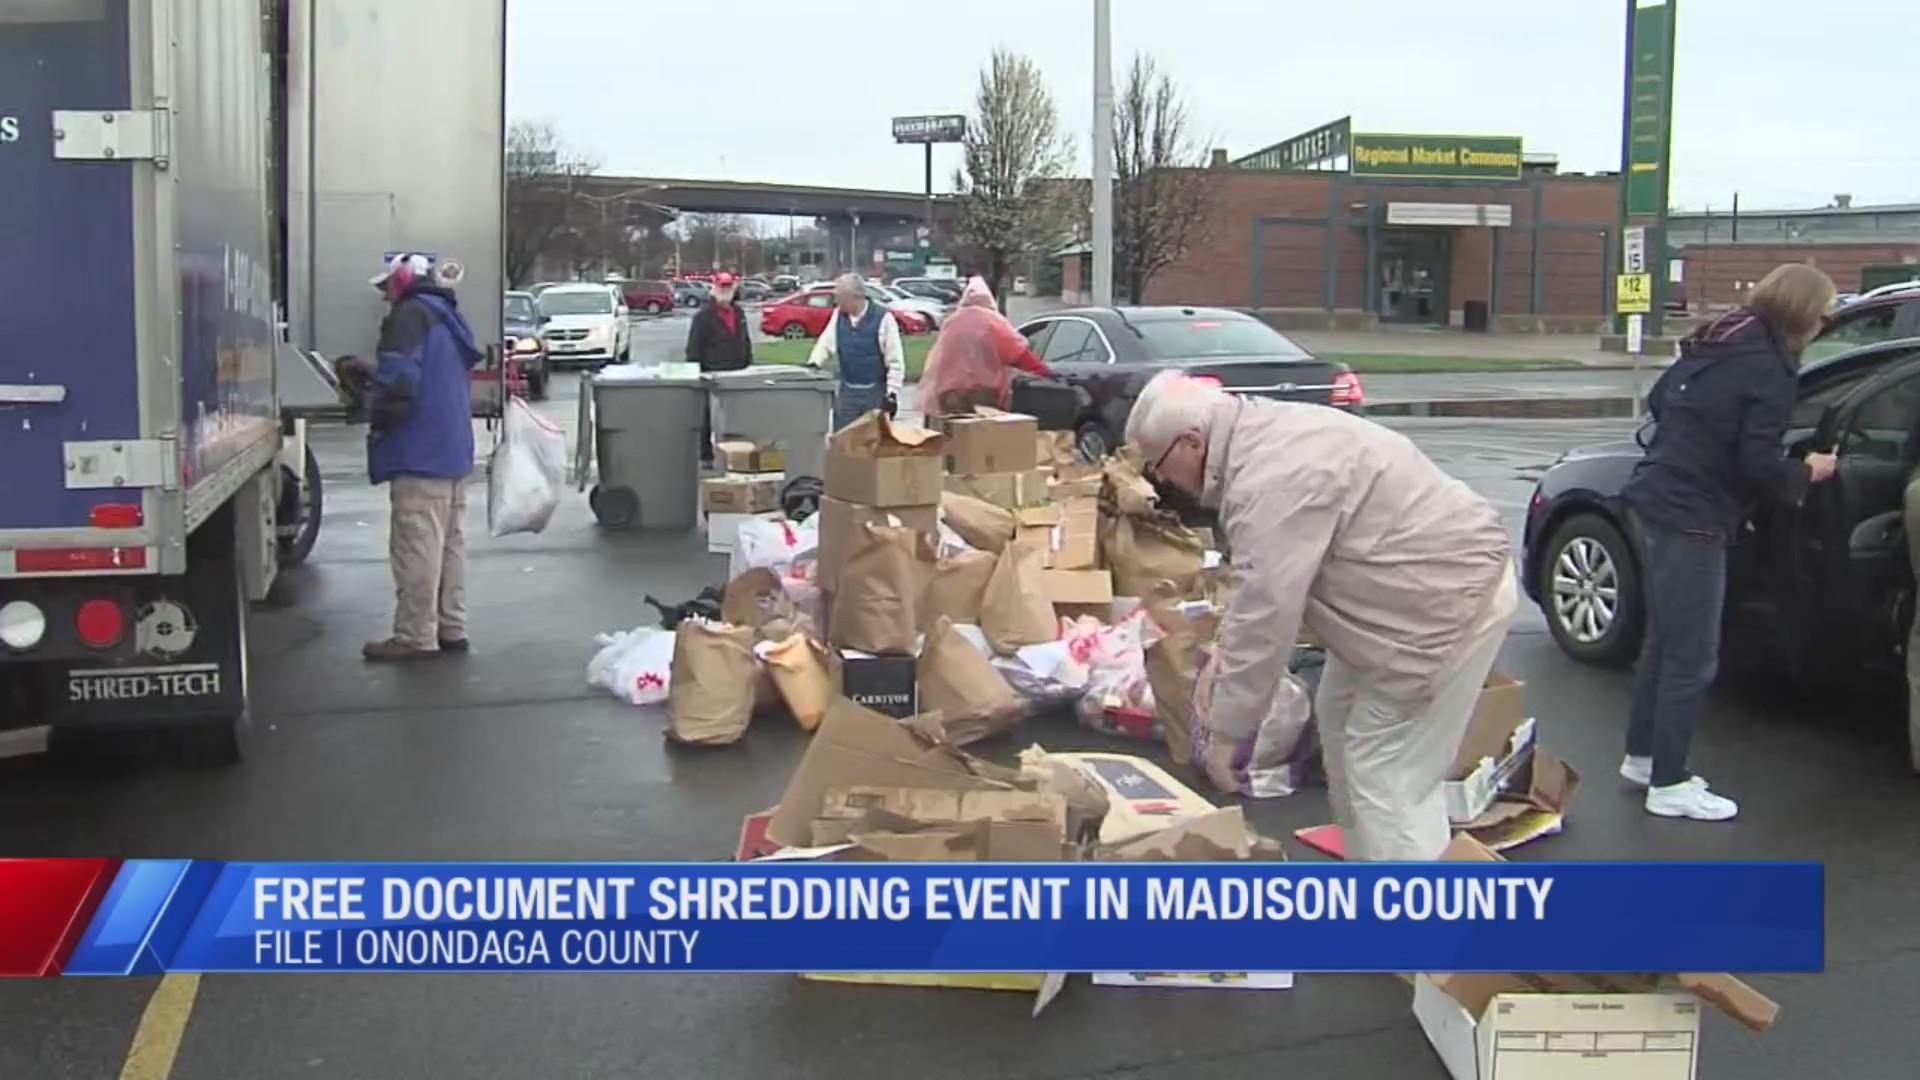 Madison_County_holding_document_shreddin_0_20190604212411